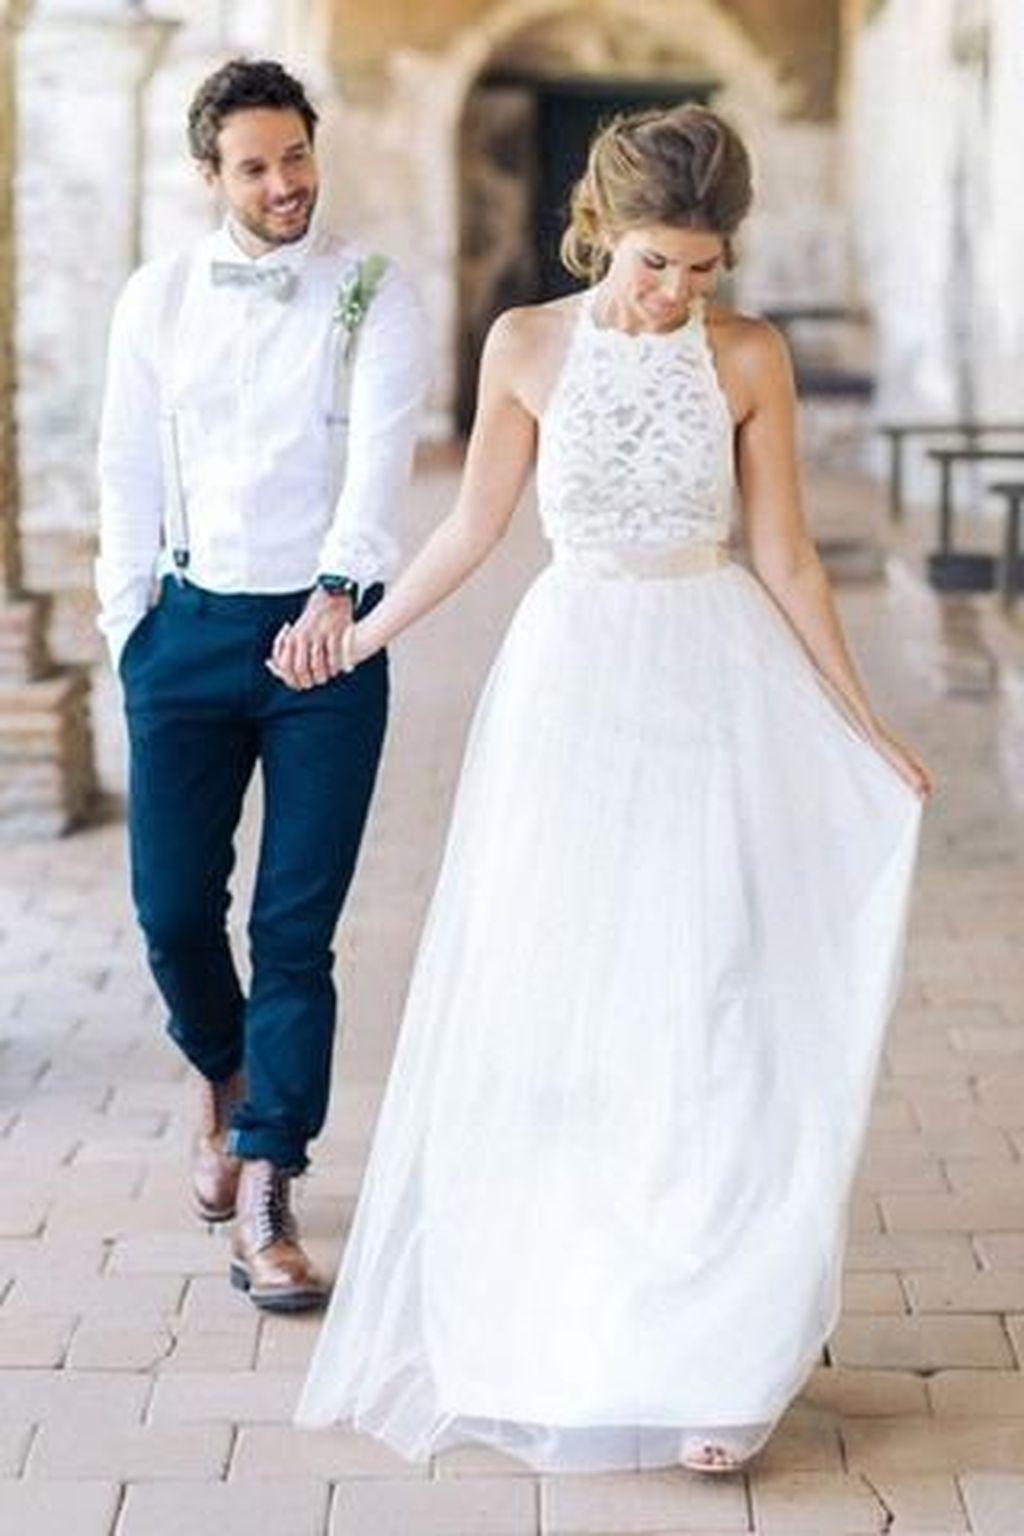 Best Princess Wedding Dress Ideas For Beach Theme 23 In 2018